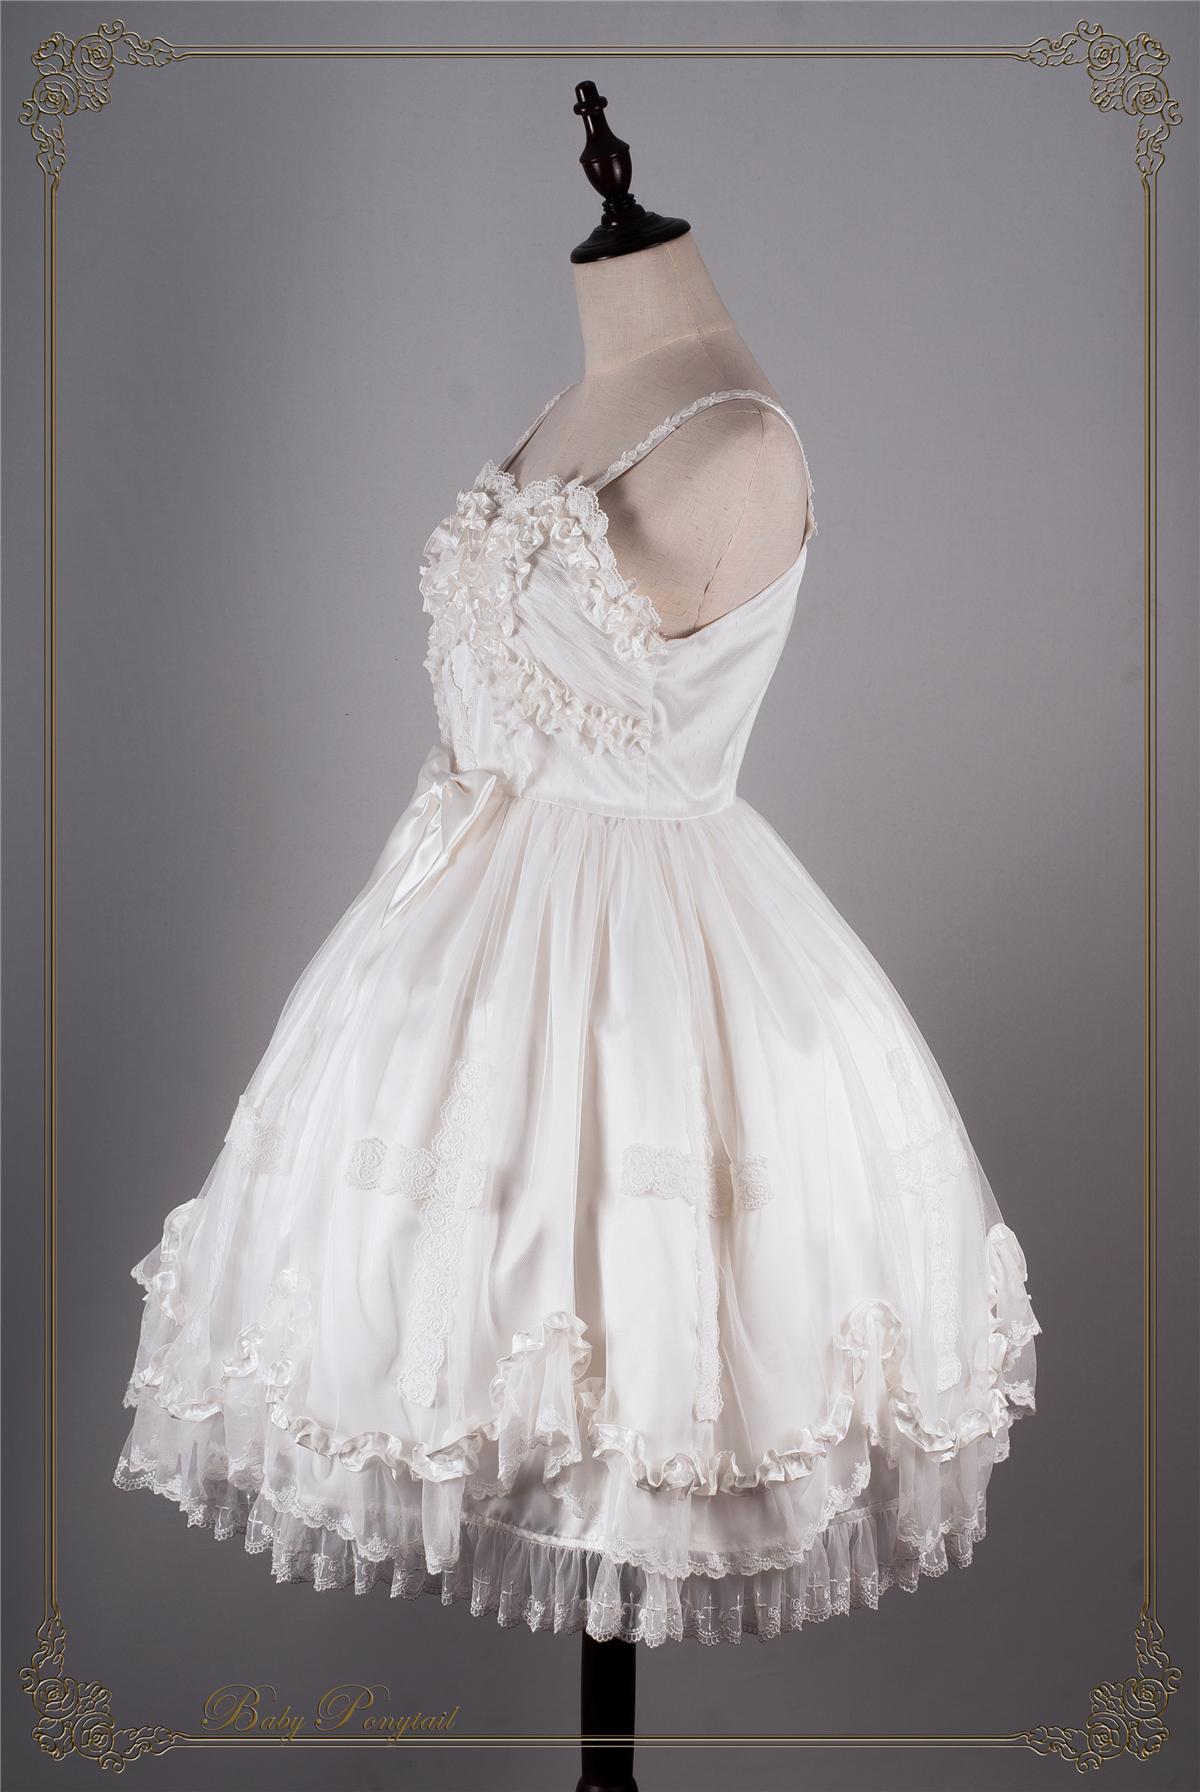 Babyponytail_Heavenly Teardrops_JSK White Stock Photo_10.jpg